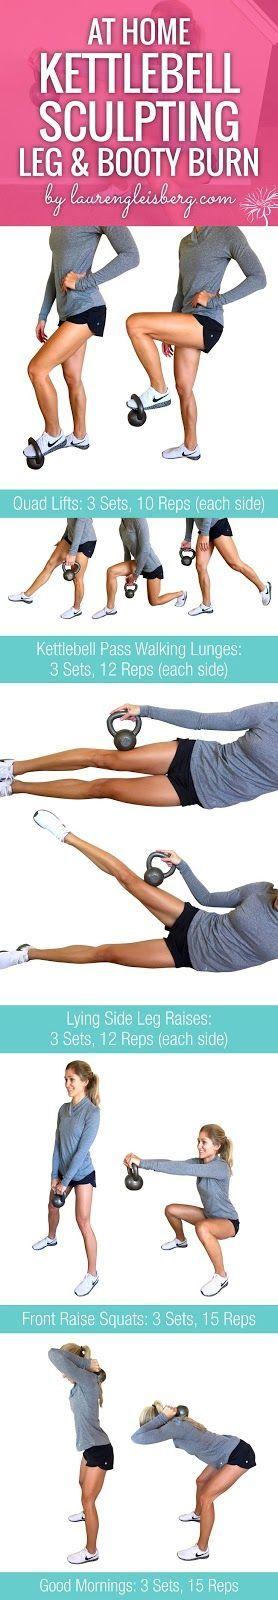 At-Home Kettlebell Leg Workout | Lauren Gleisberg | Bloglovin'